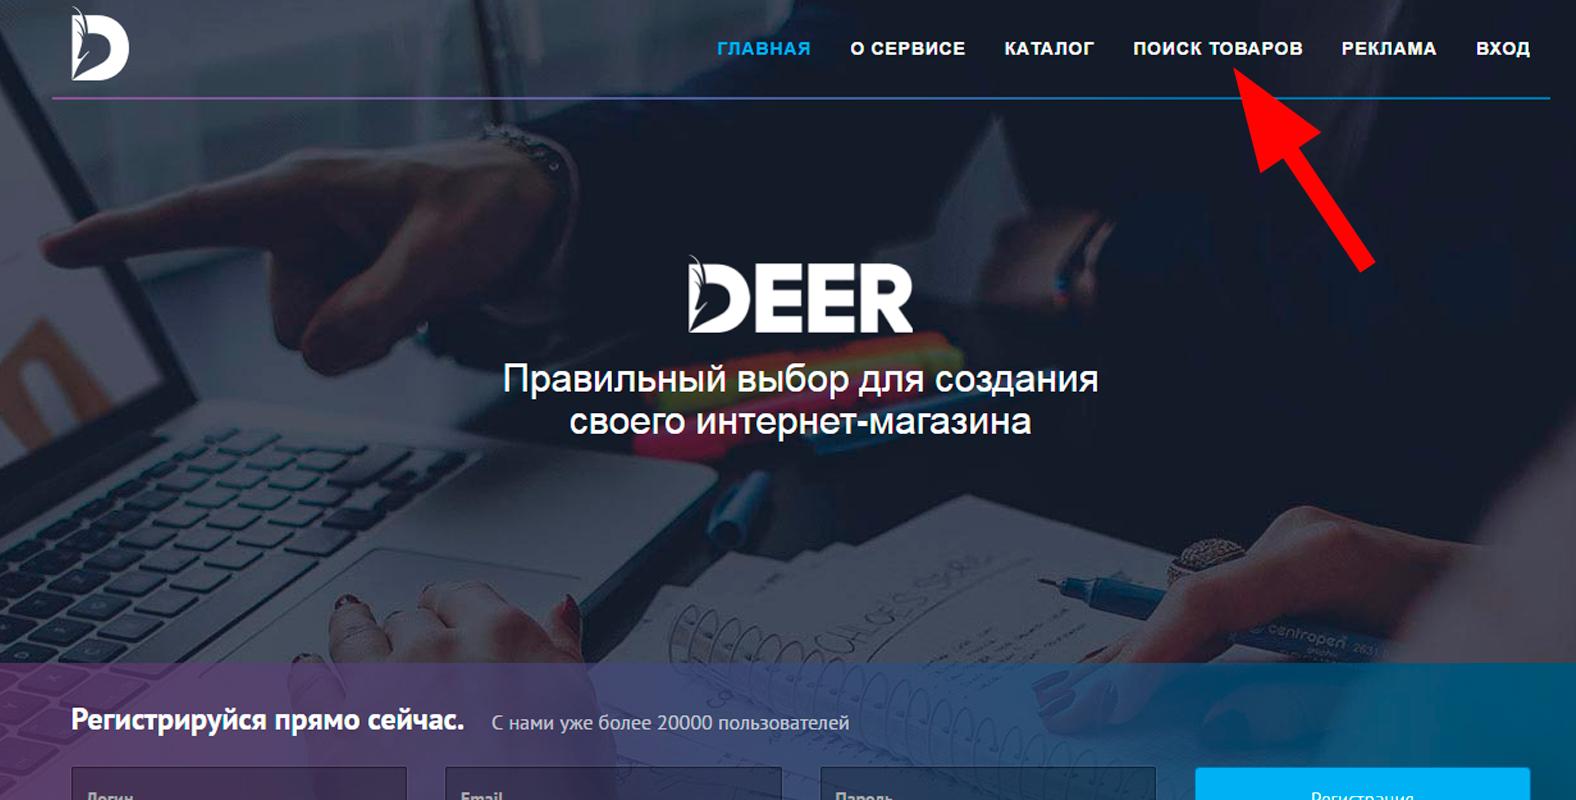 Платформа для аренды интернет-магазина Дир